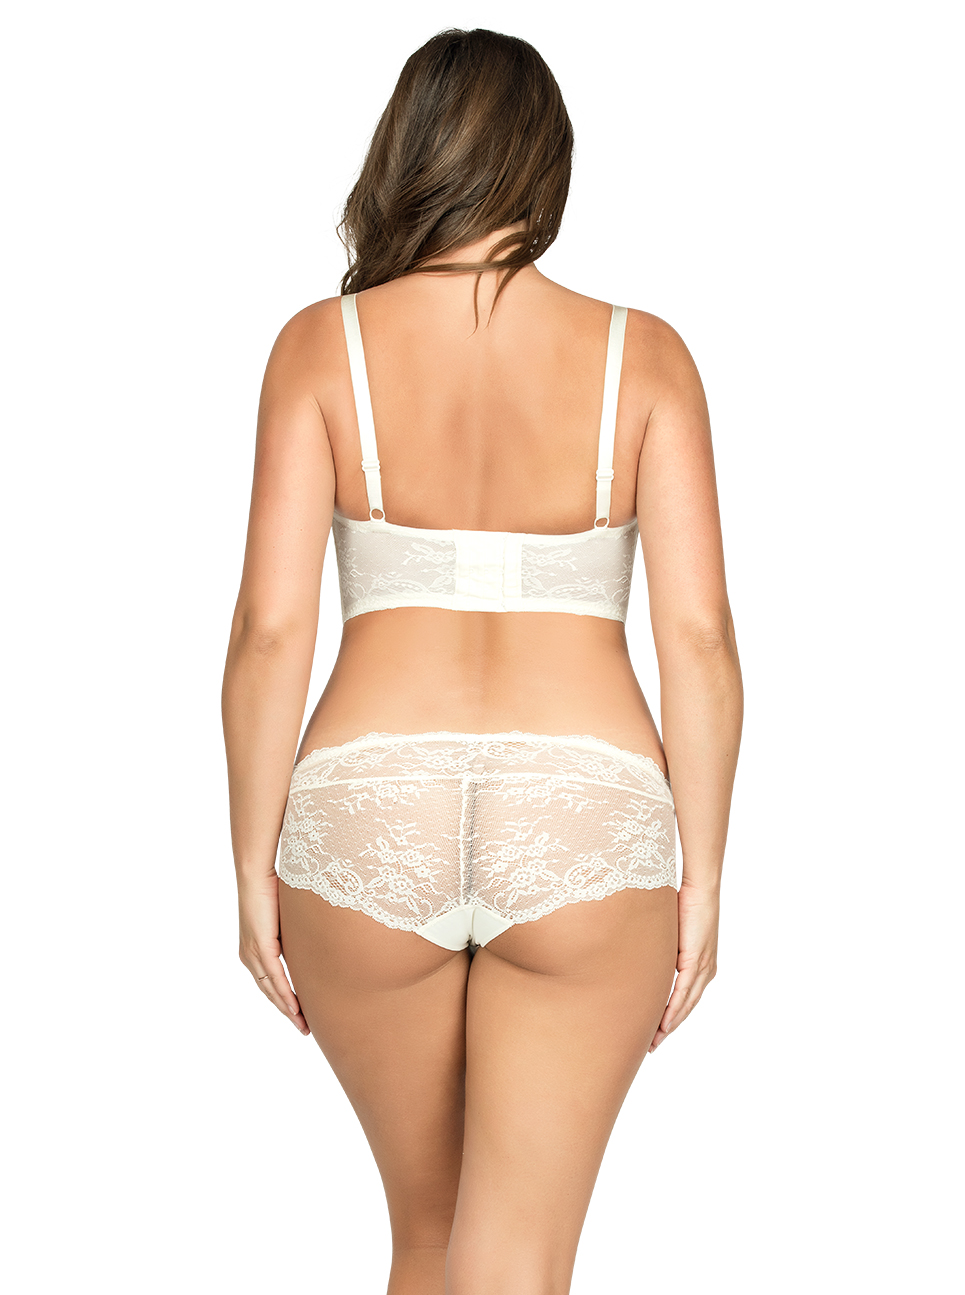 PARFAIT Sandrine PlungeLonglineBraP5351 HipsterP5355 Ivory Back - Sandrine Longline Bra Ivory P5351